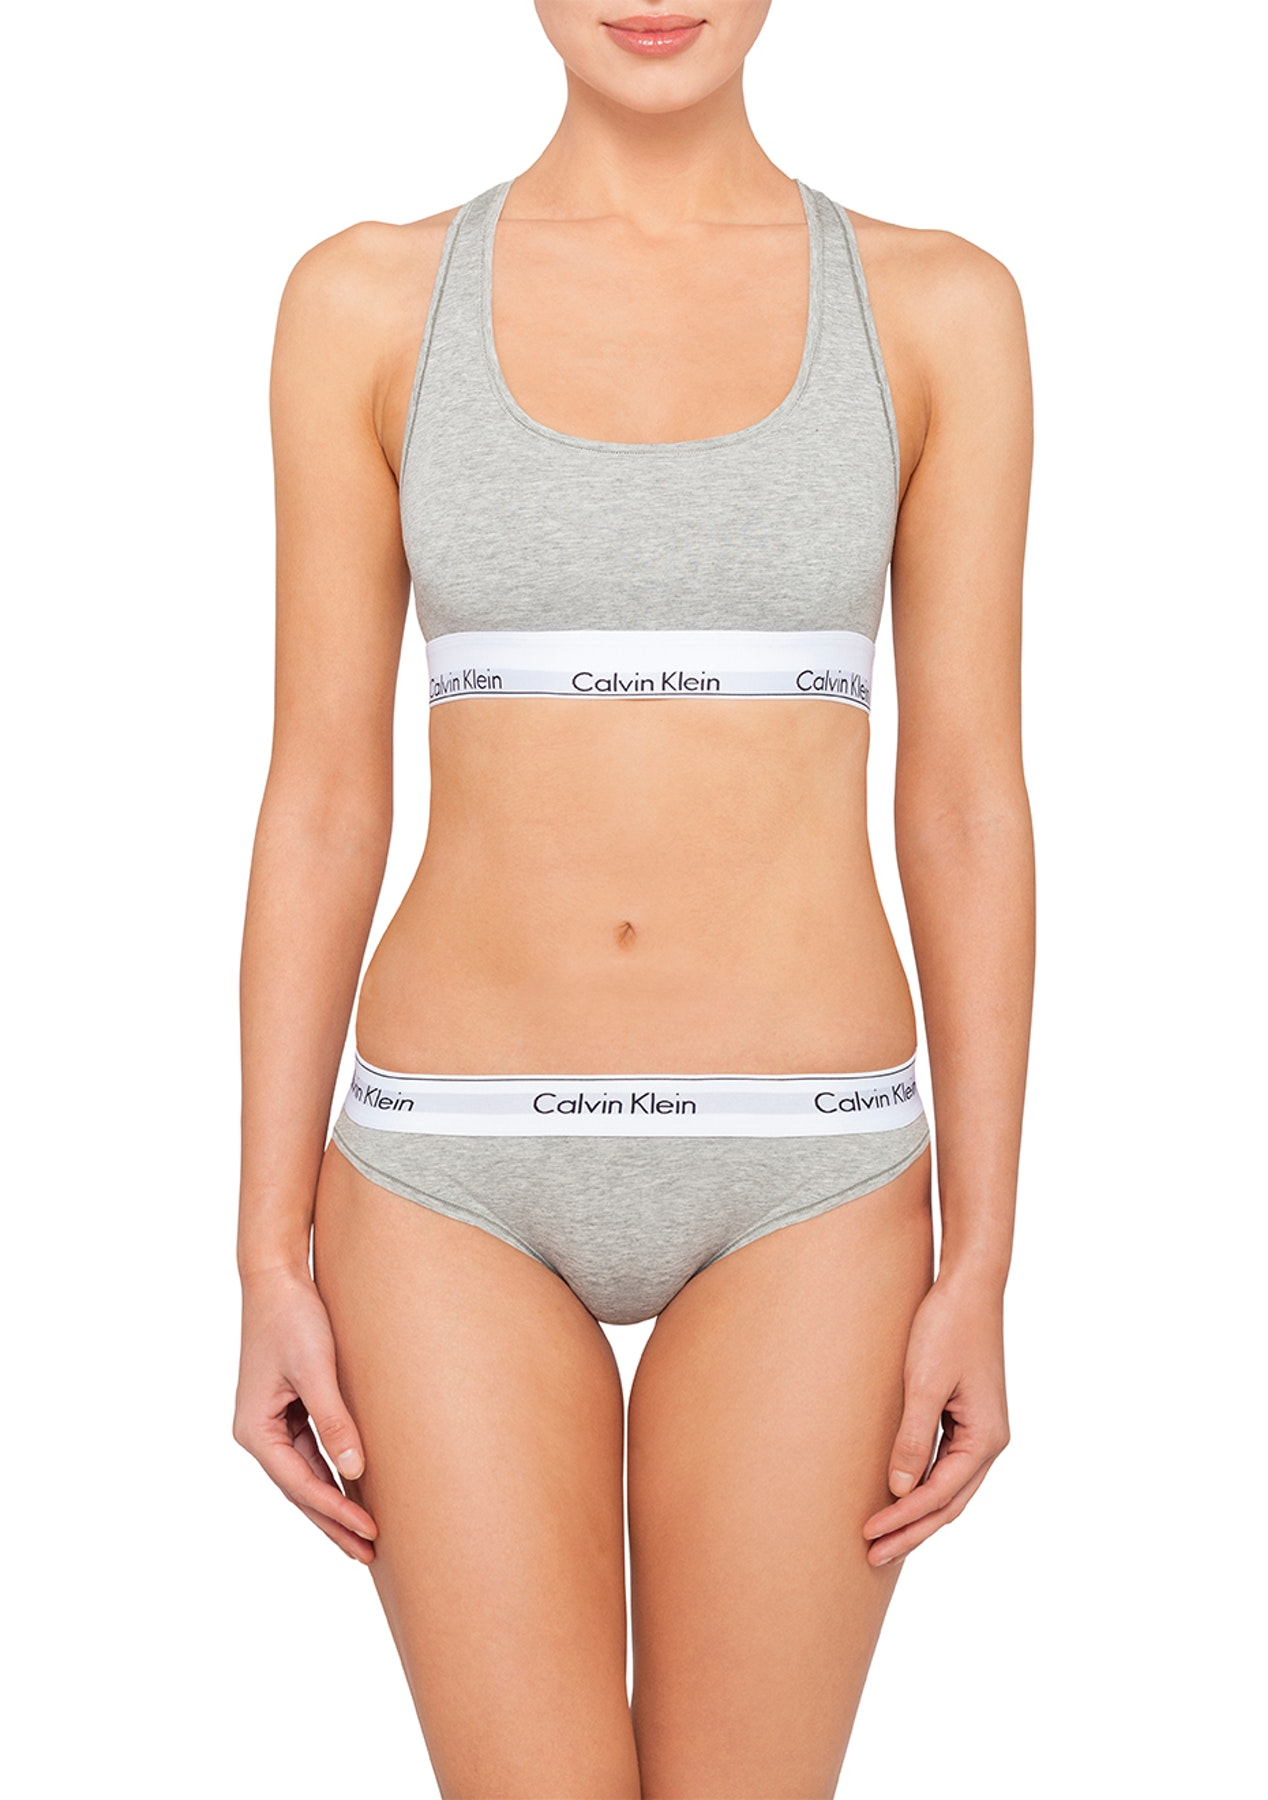 Calvin Klein - Modern Cotton Bikini - Grey Heather - Calvin Klein Monogram  Range   More - Onceit aeac7d47a